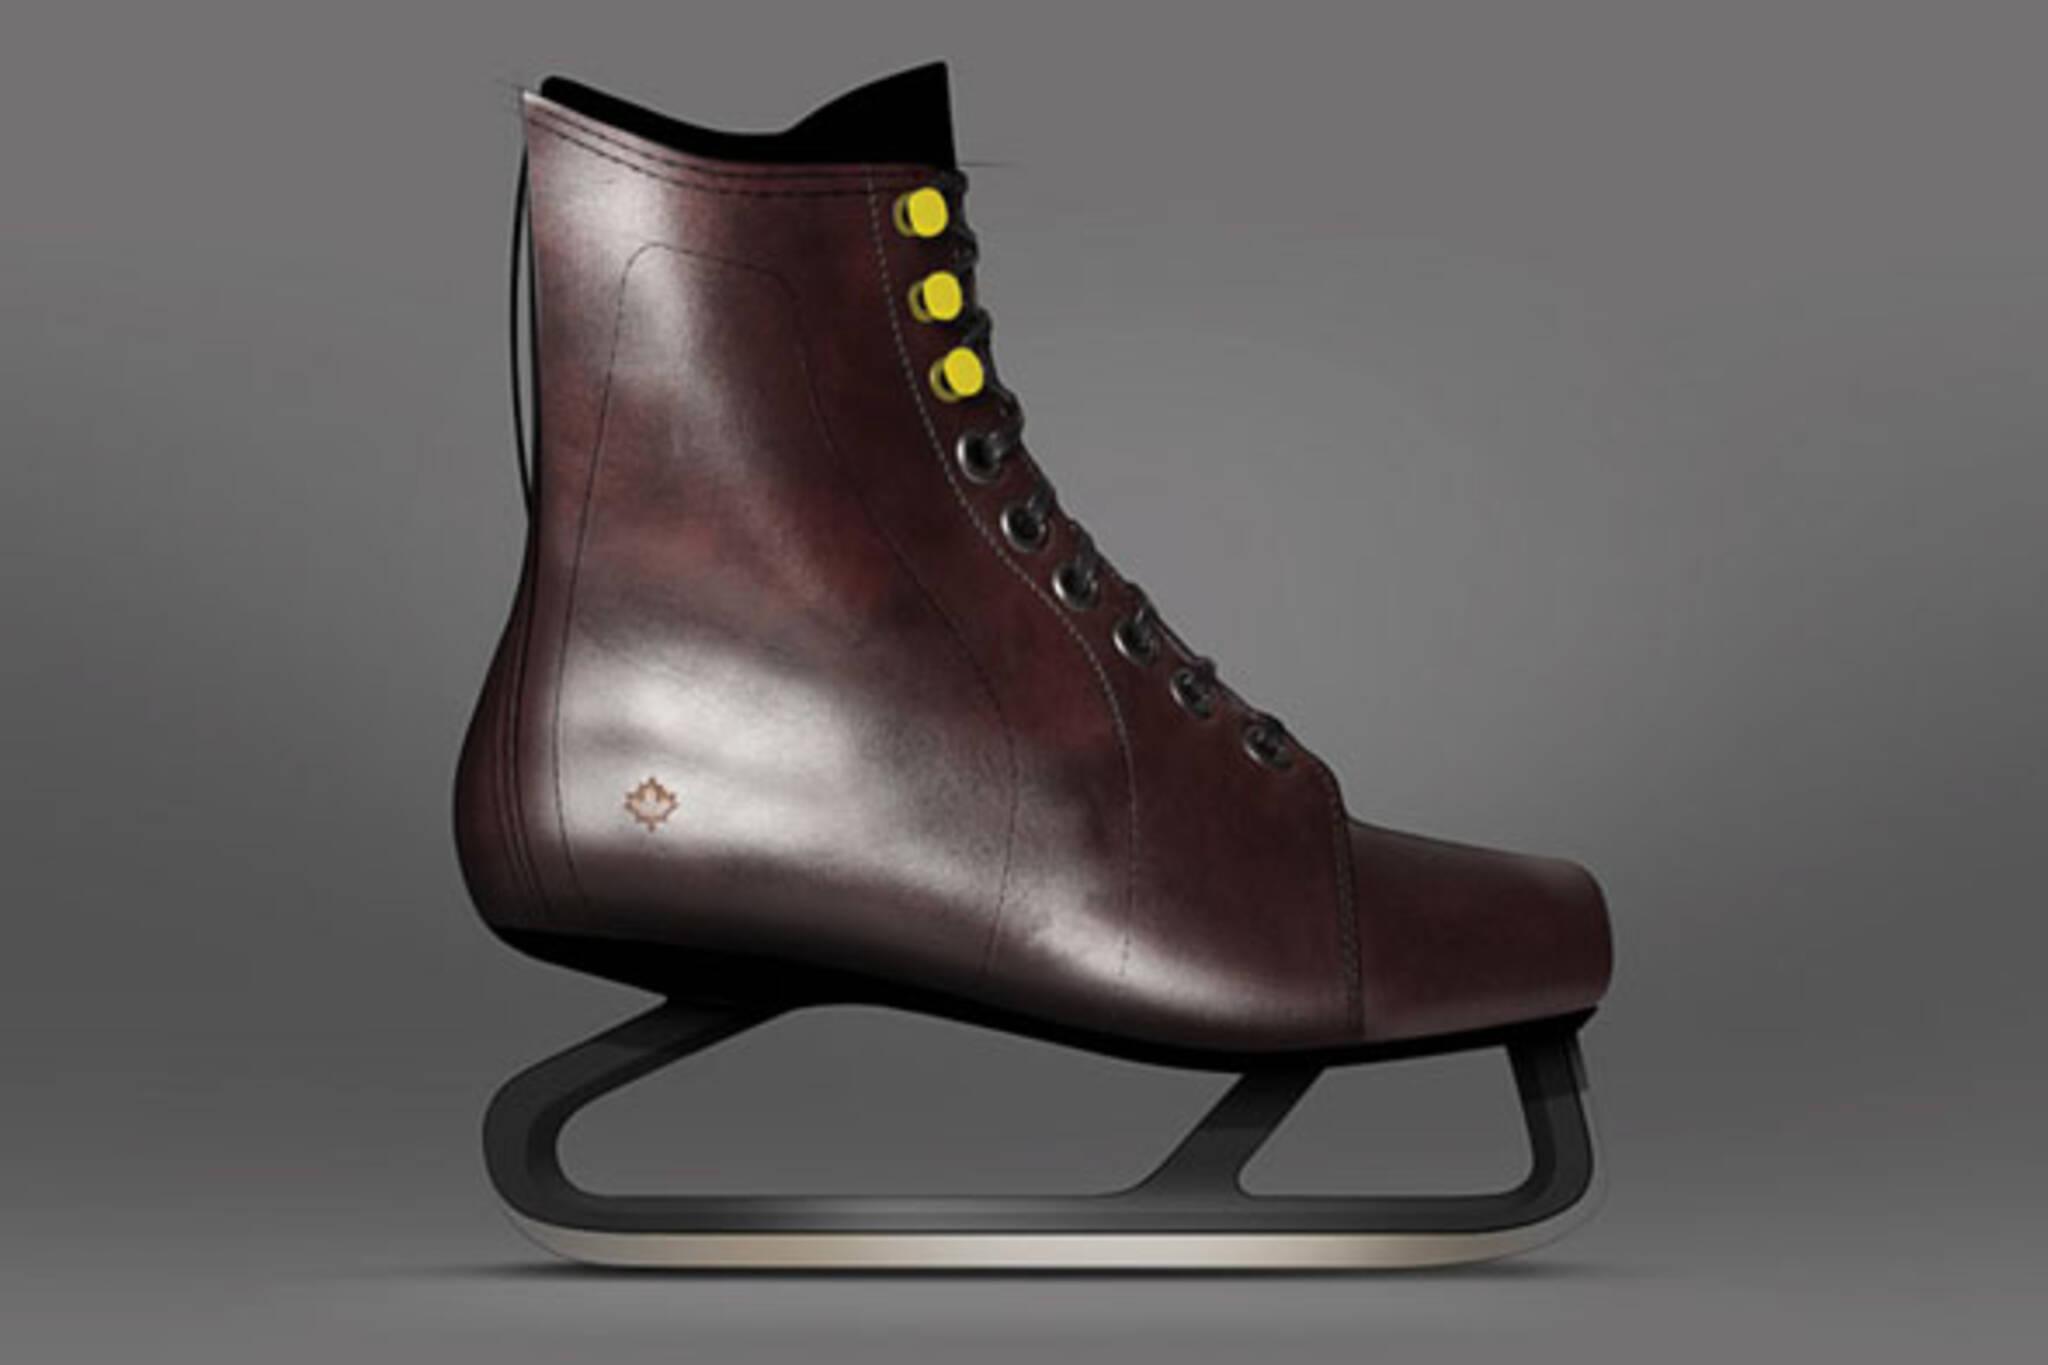 jacknife skates toronto